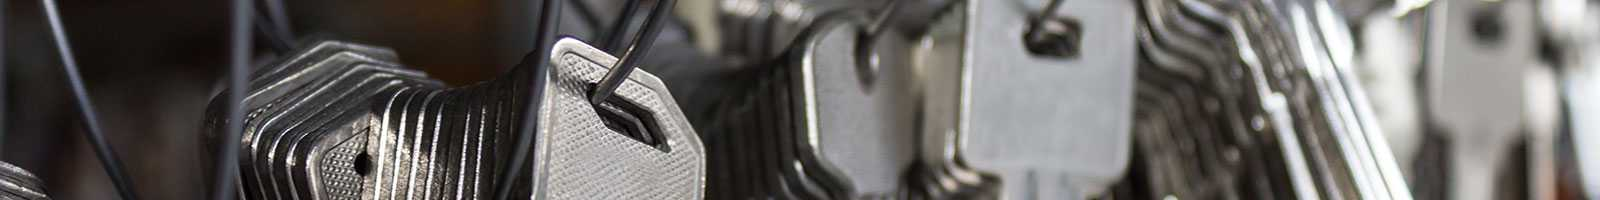 Sleutelservice De Fietsenmaker Apeldoorn